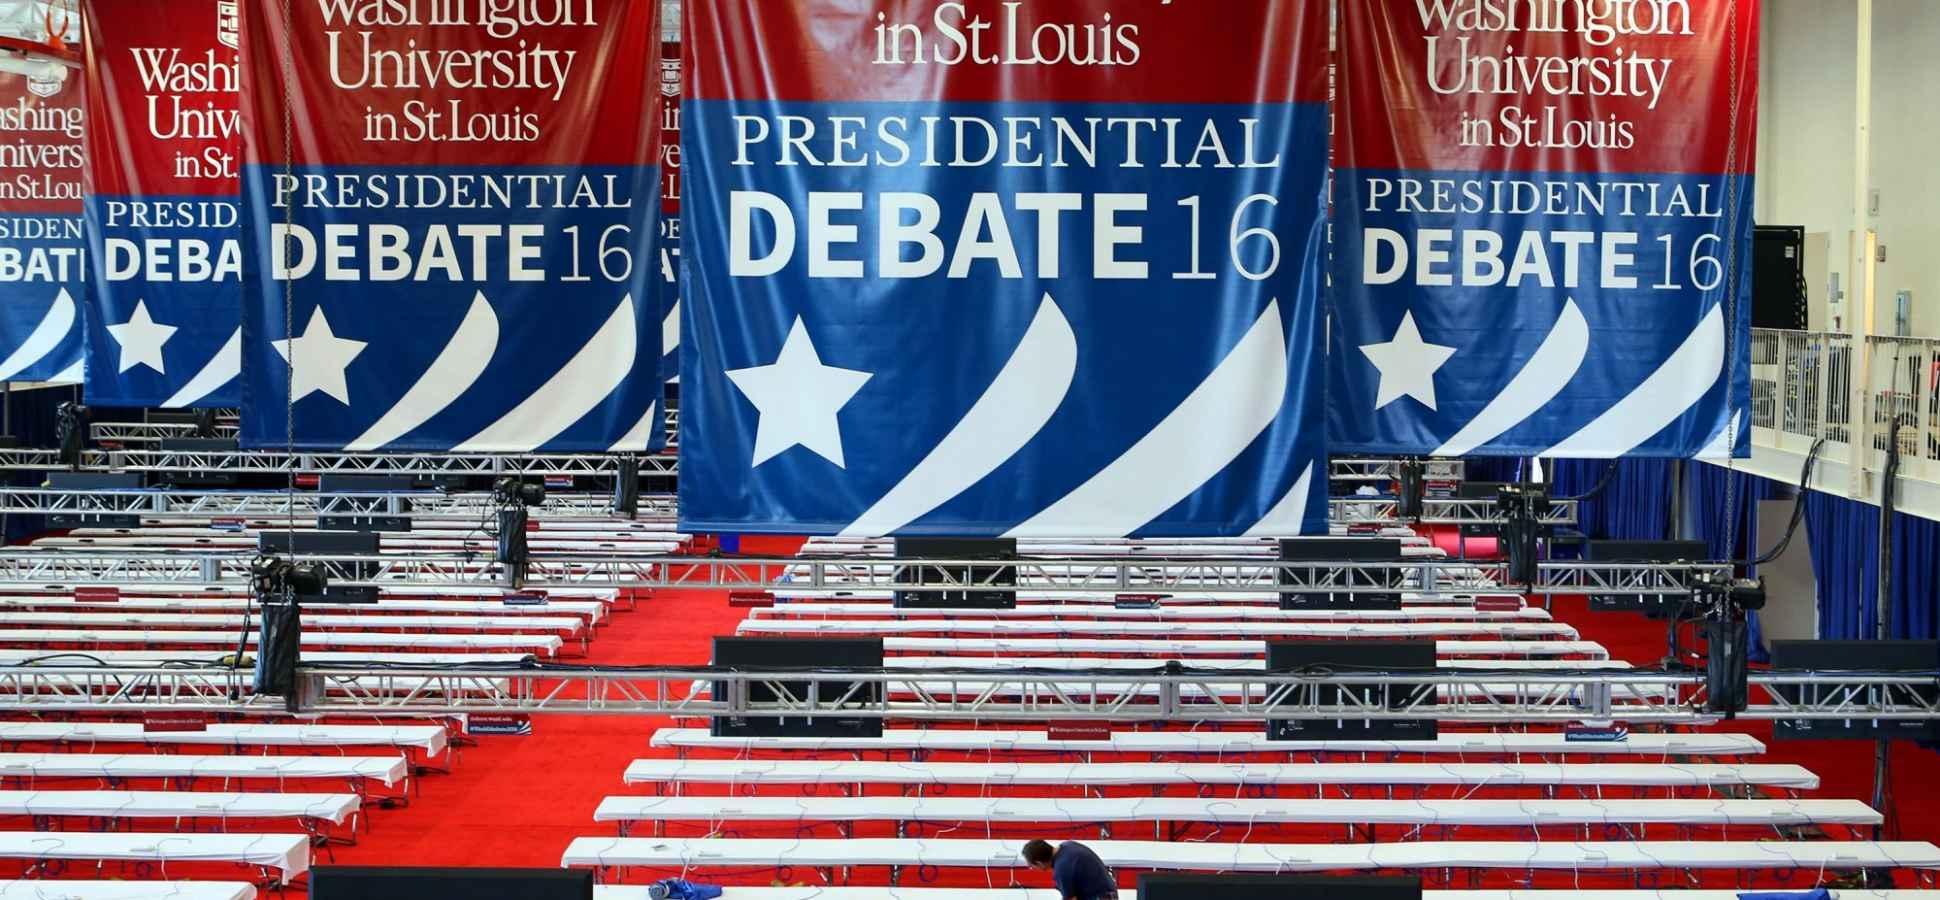 How Social Marketing Technology Helped WashU Win the Presidential Debate